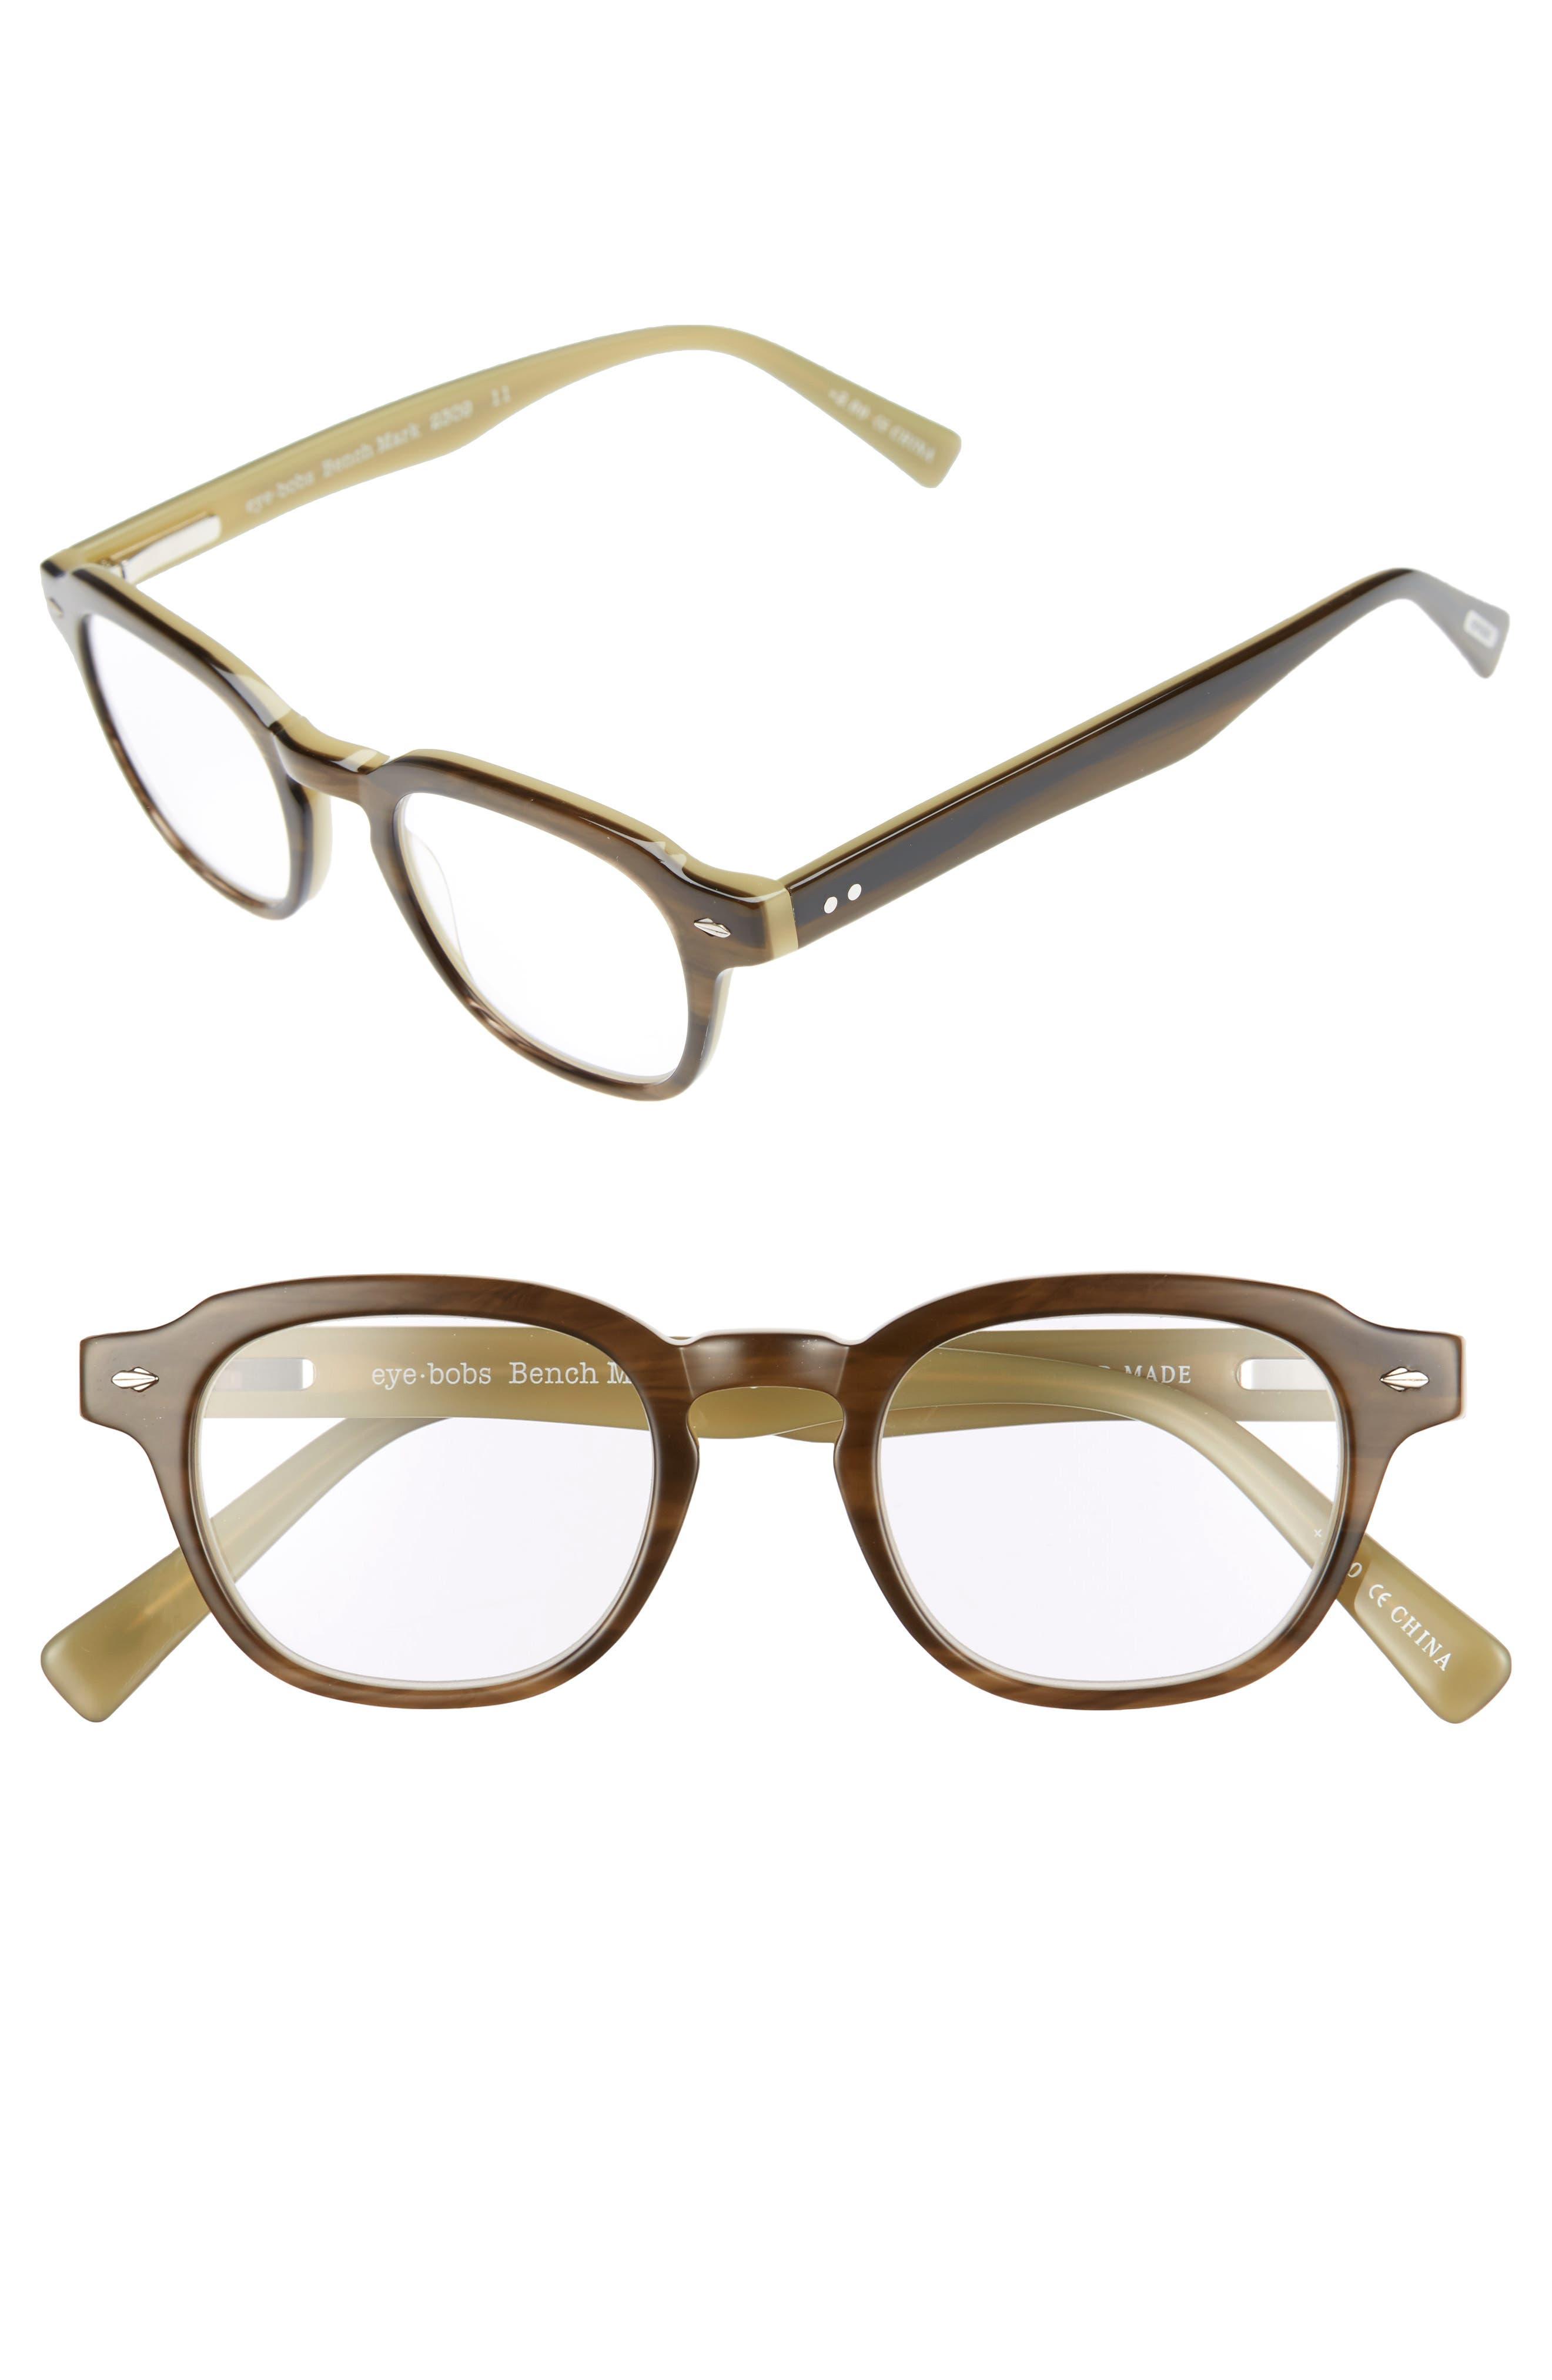 Main Image - Eyebobs Bench Mark 46mm Reading Glasses